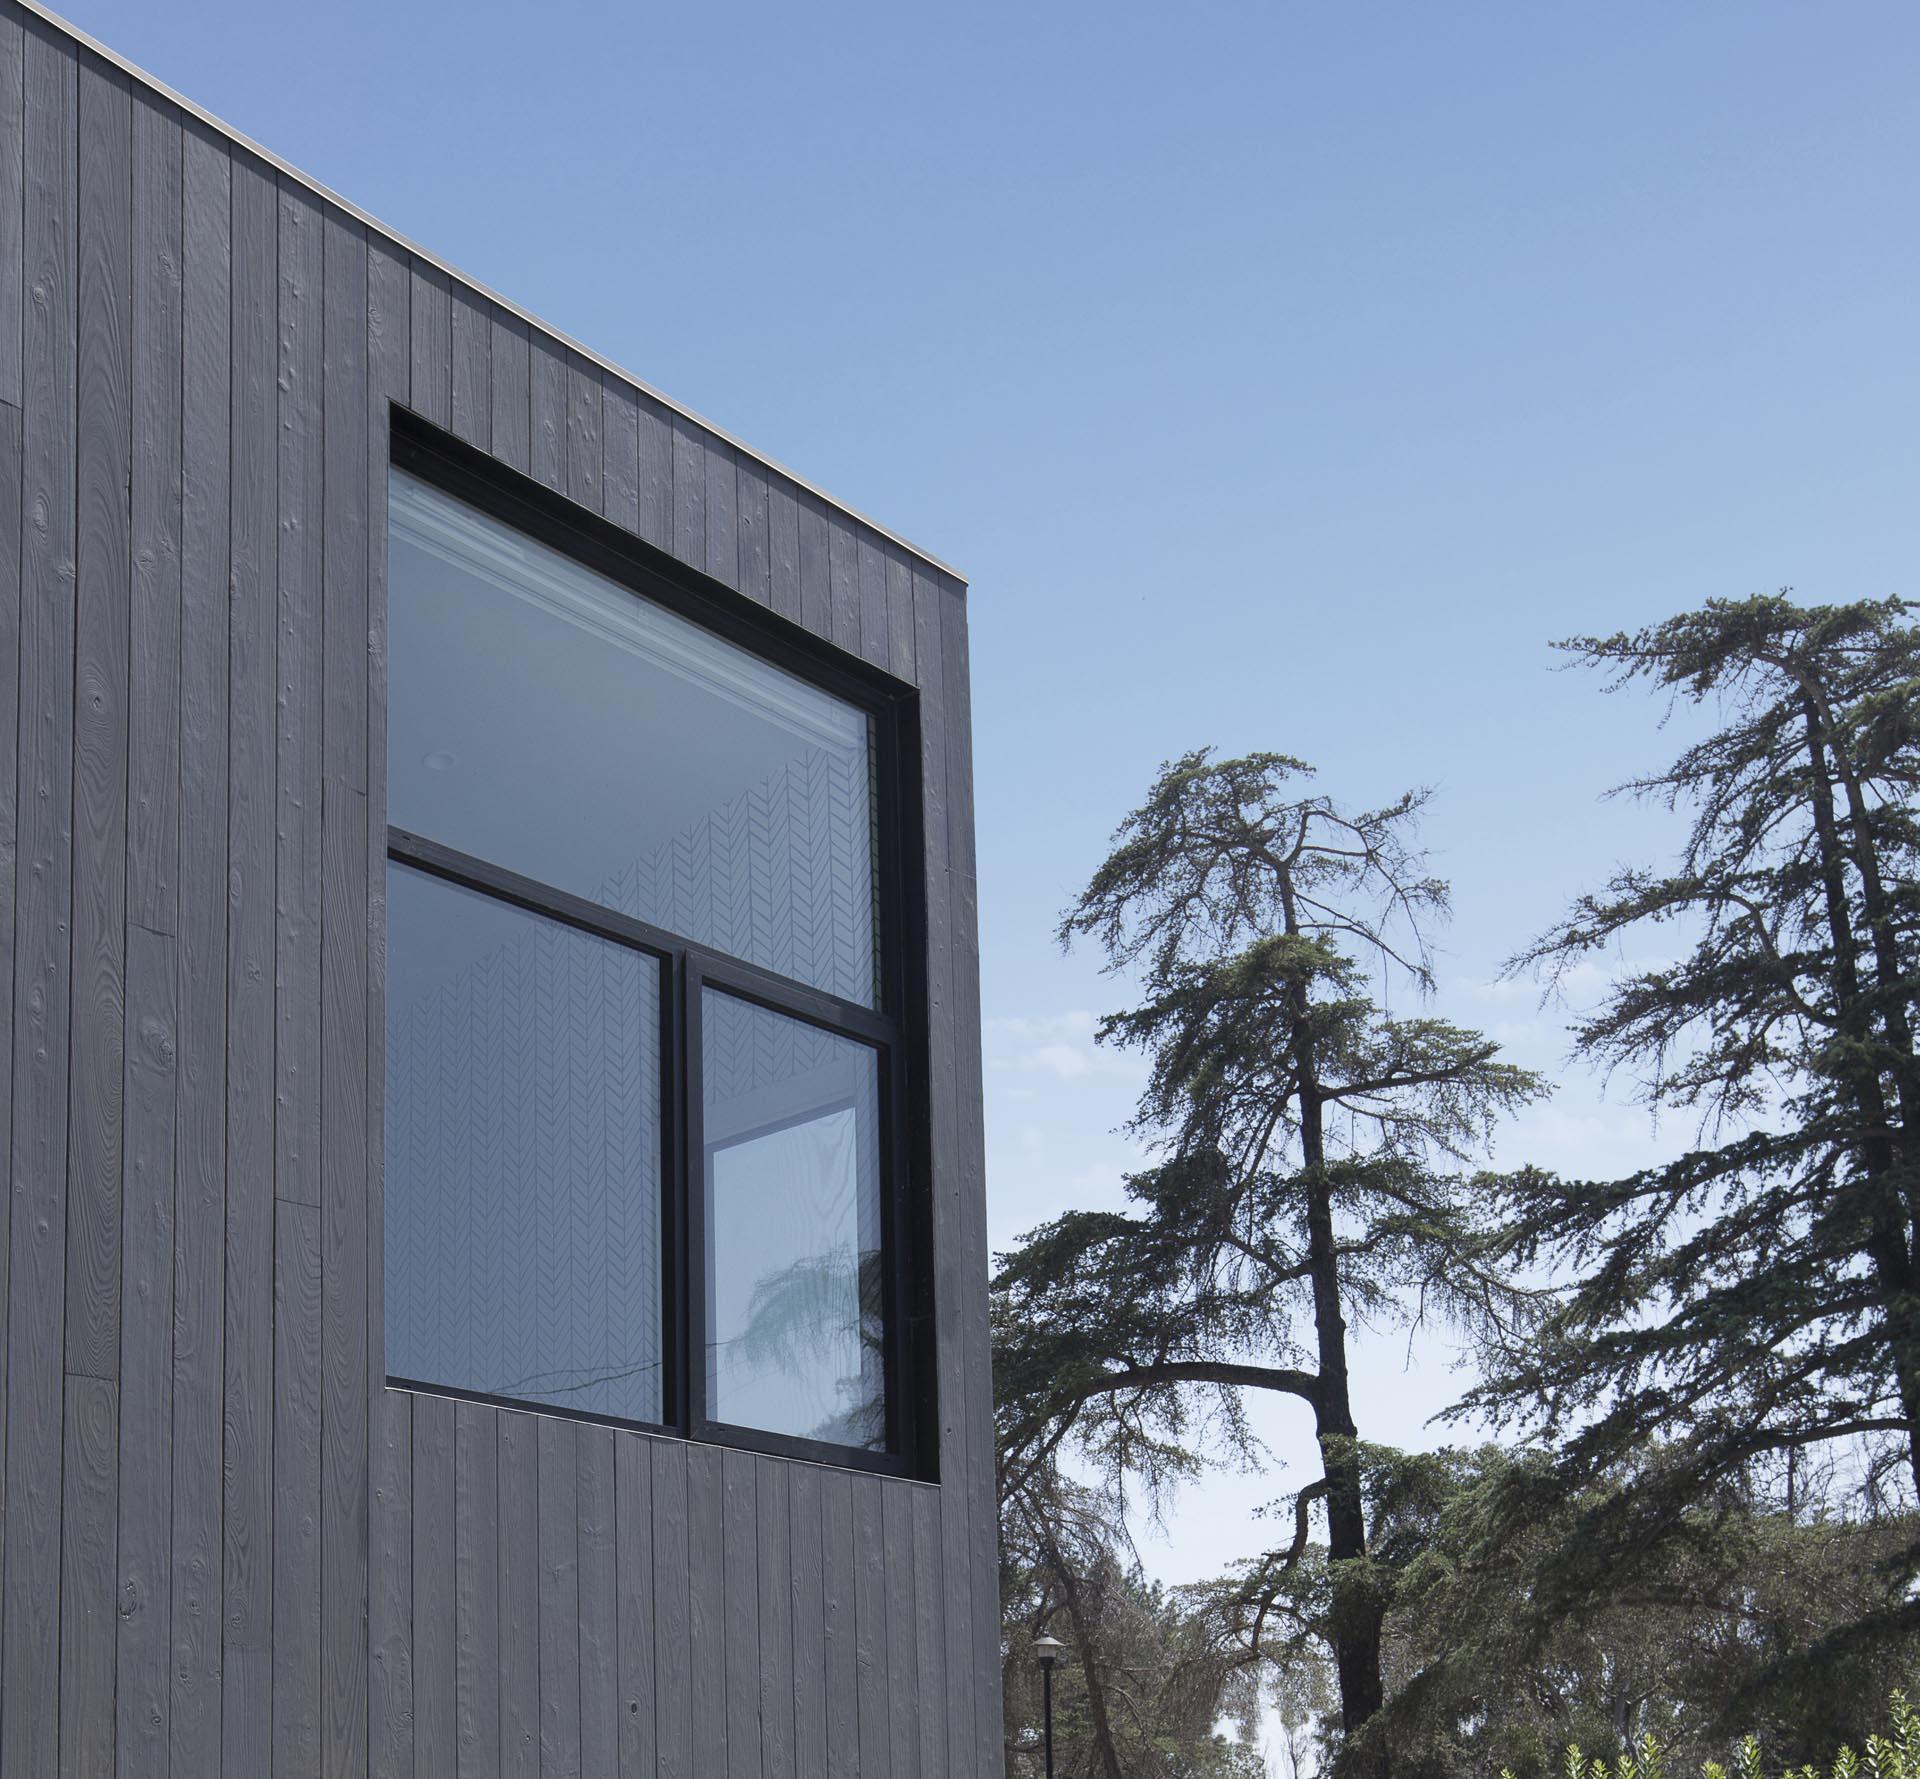 A modern home with Shou Sugi Ban exterior siding and black window frames.